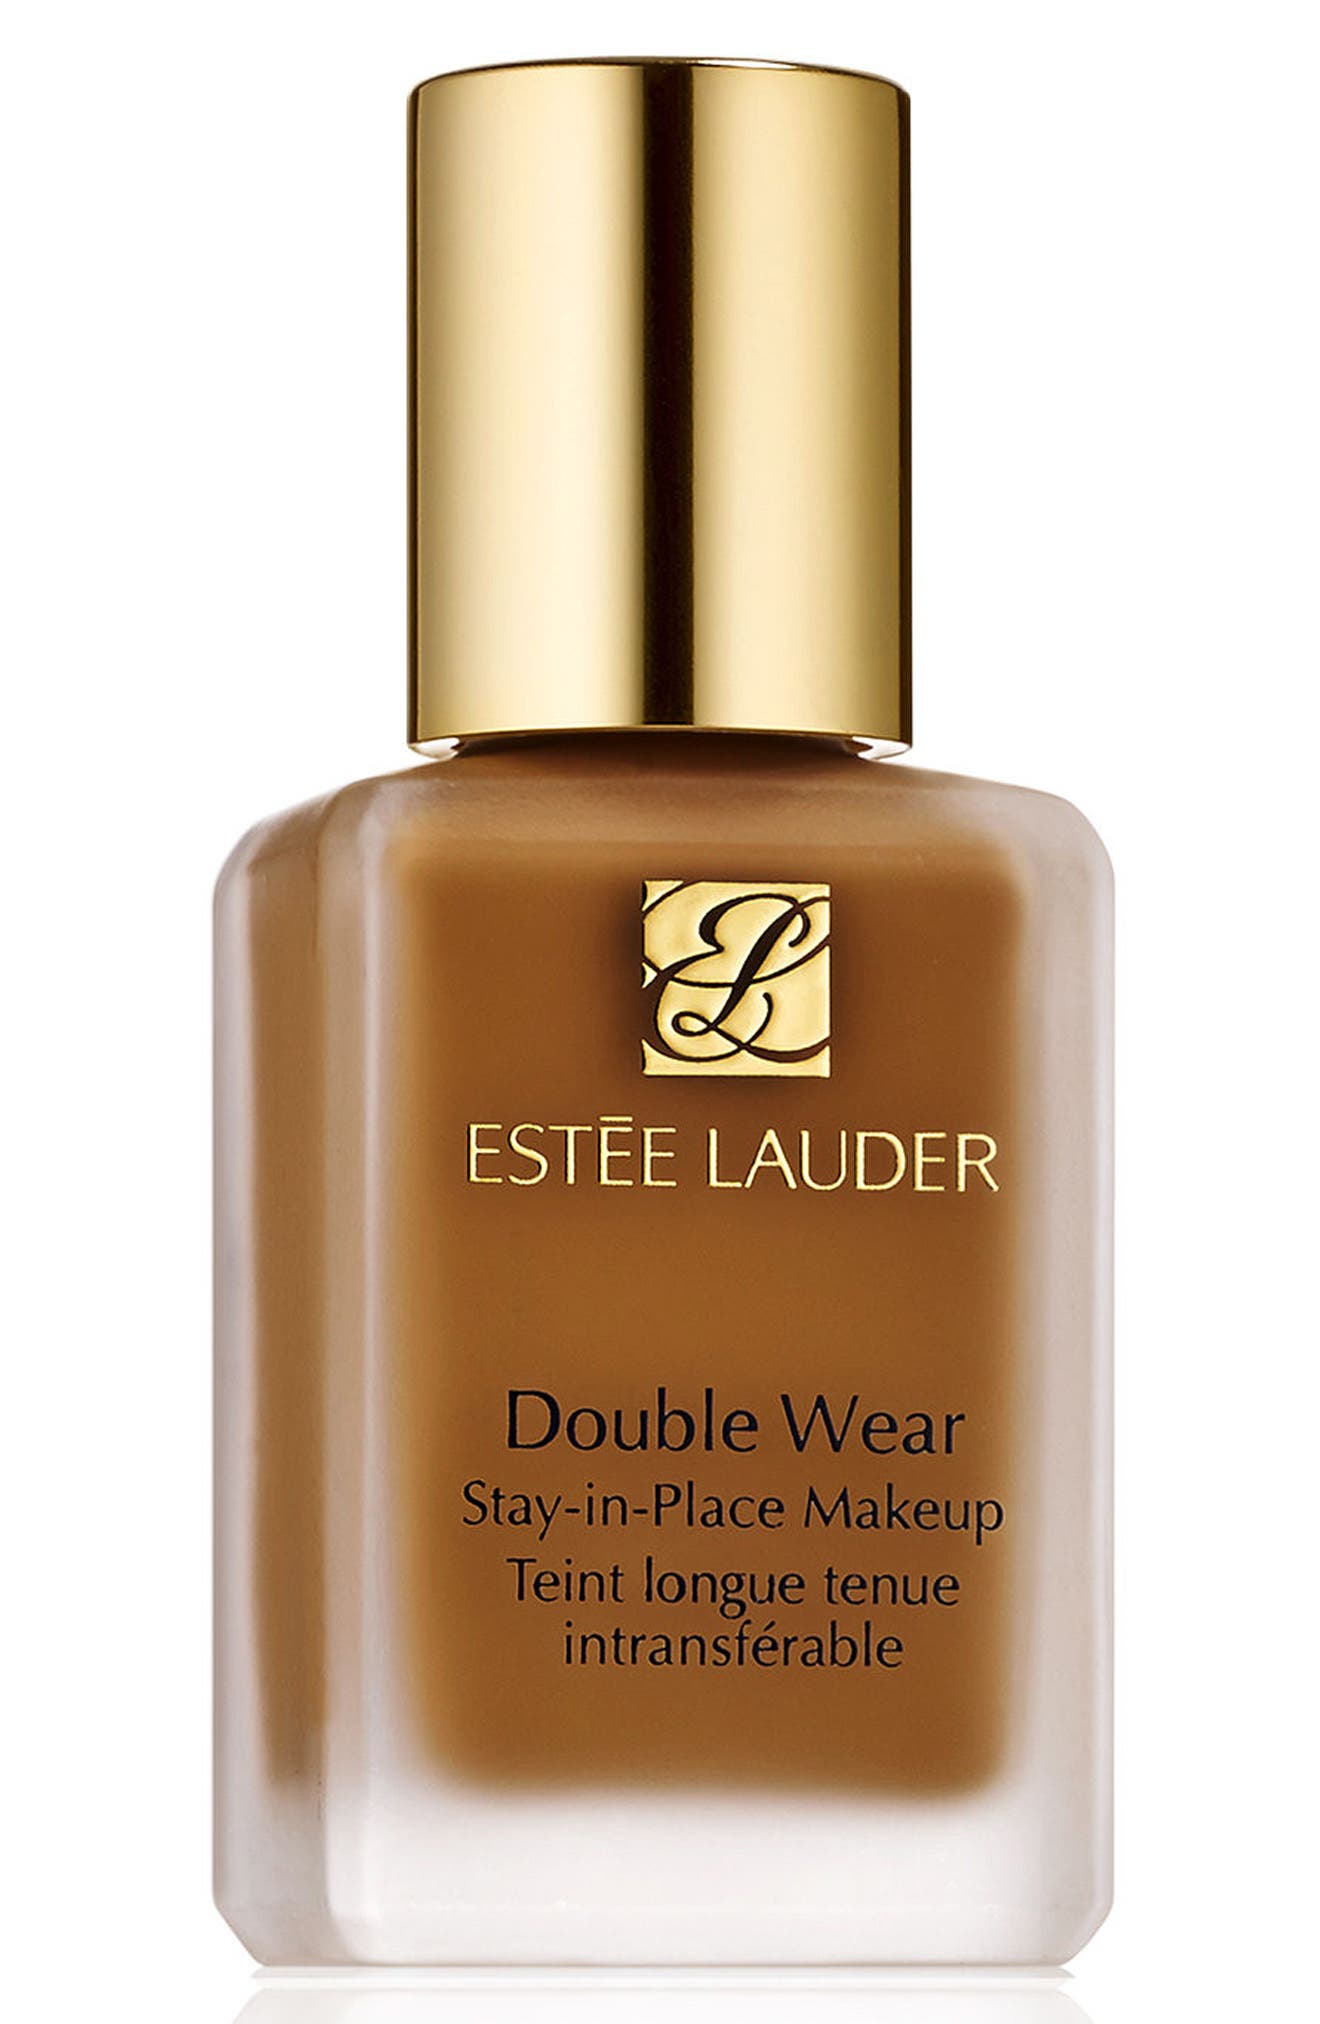 Estee Lauder Double Wear Stay-In-Place Liquid Makeup - 5C1 Rich Chestnut